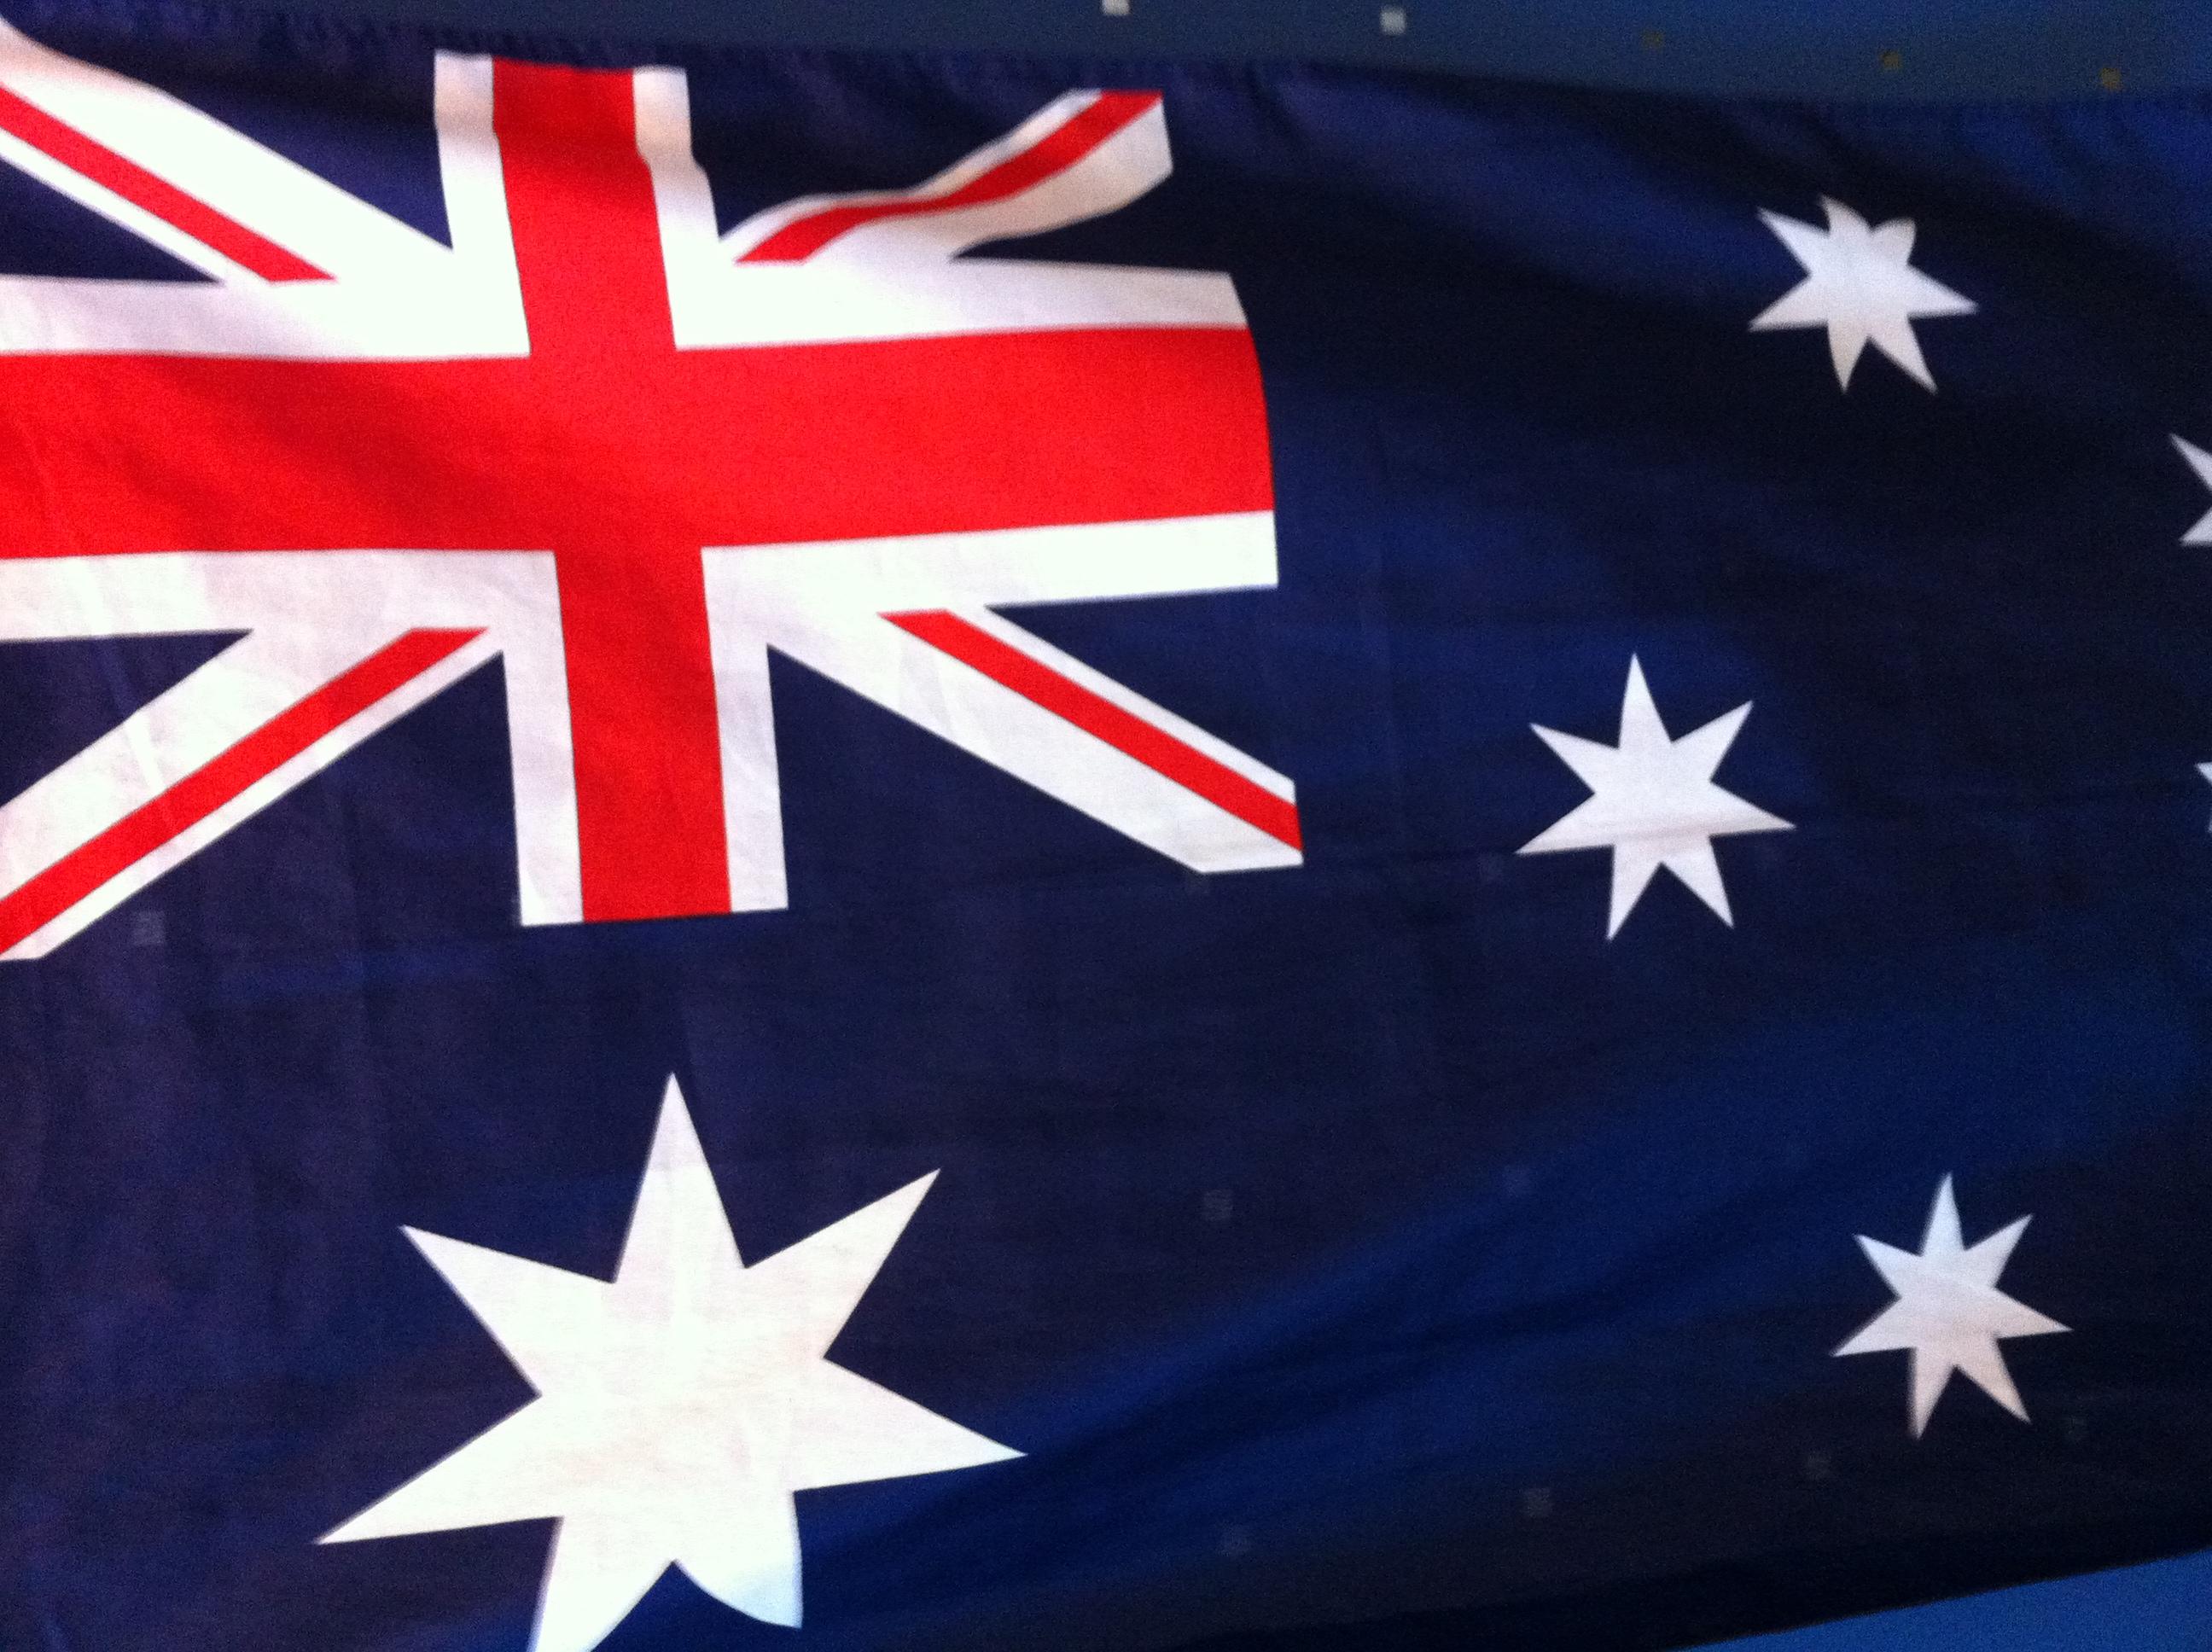 Caption: Australian flag